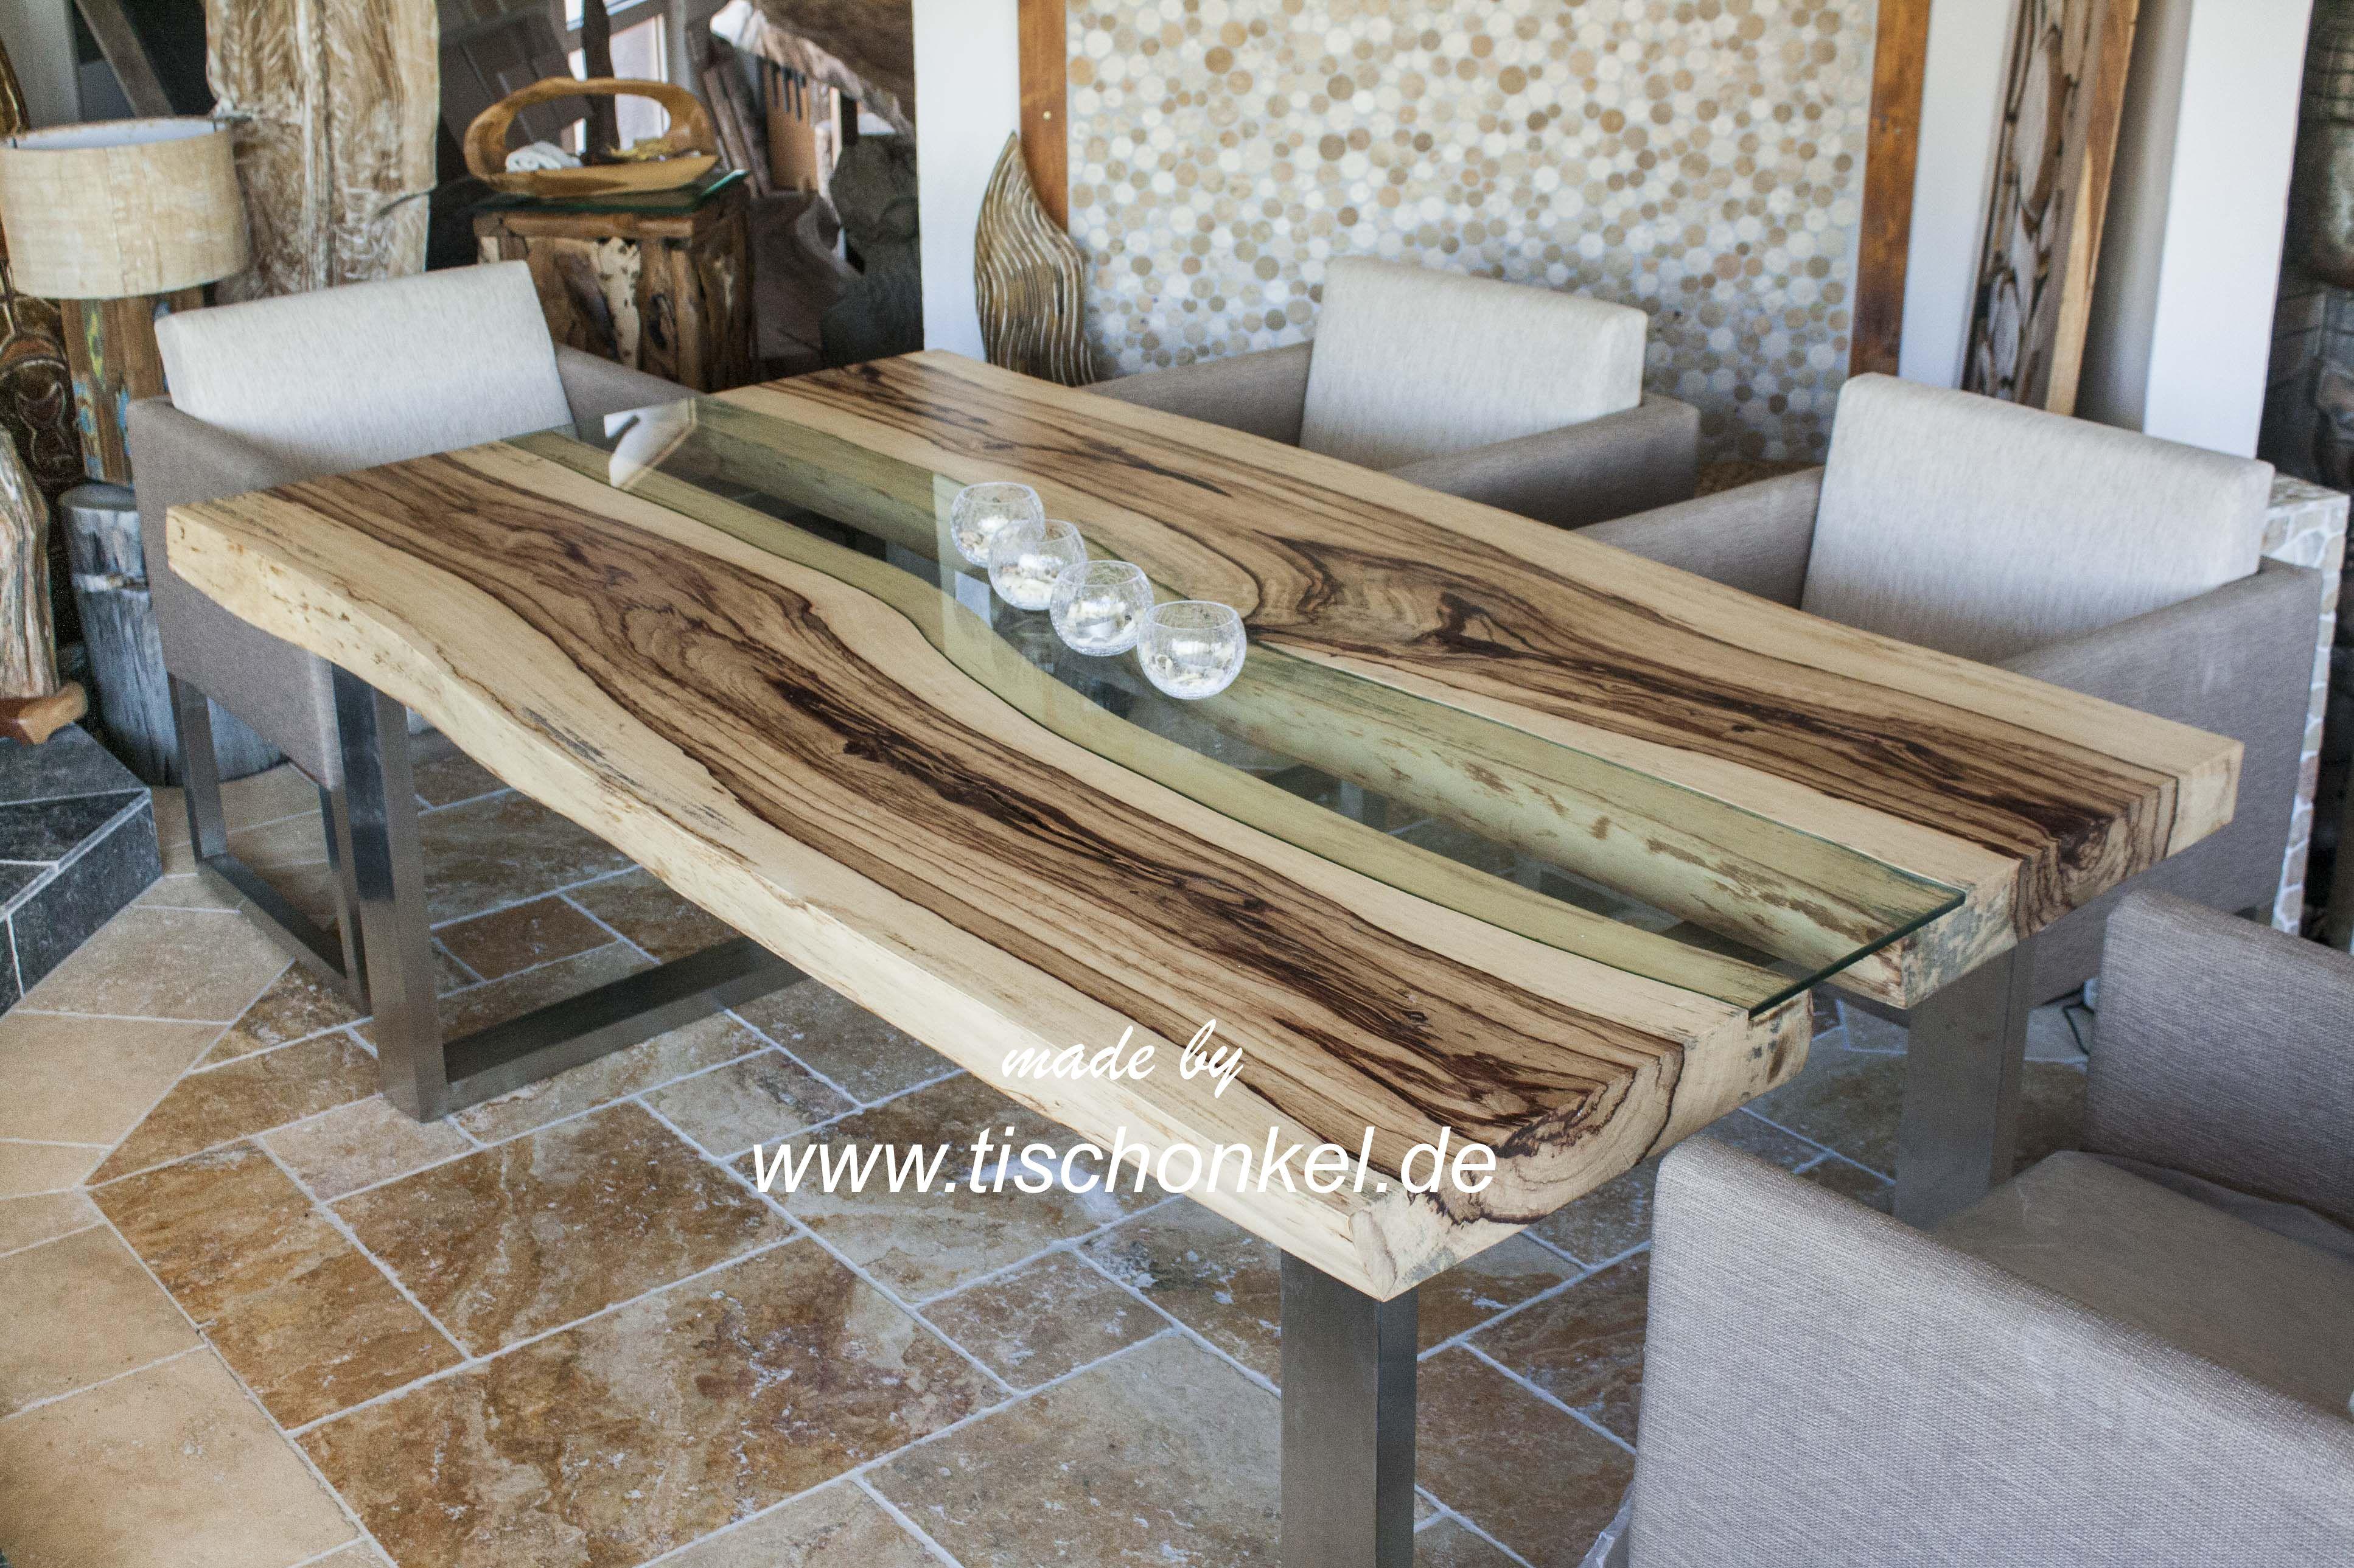 Designertisch Der Extraklasse Der Tischonkel